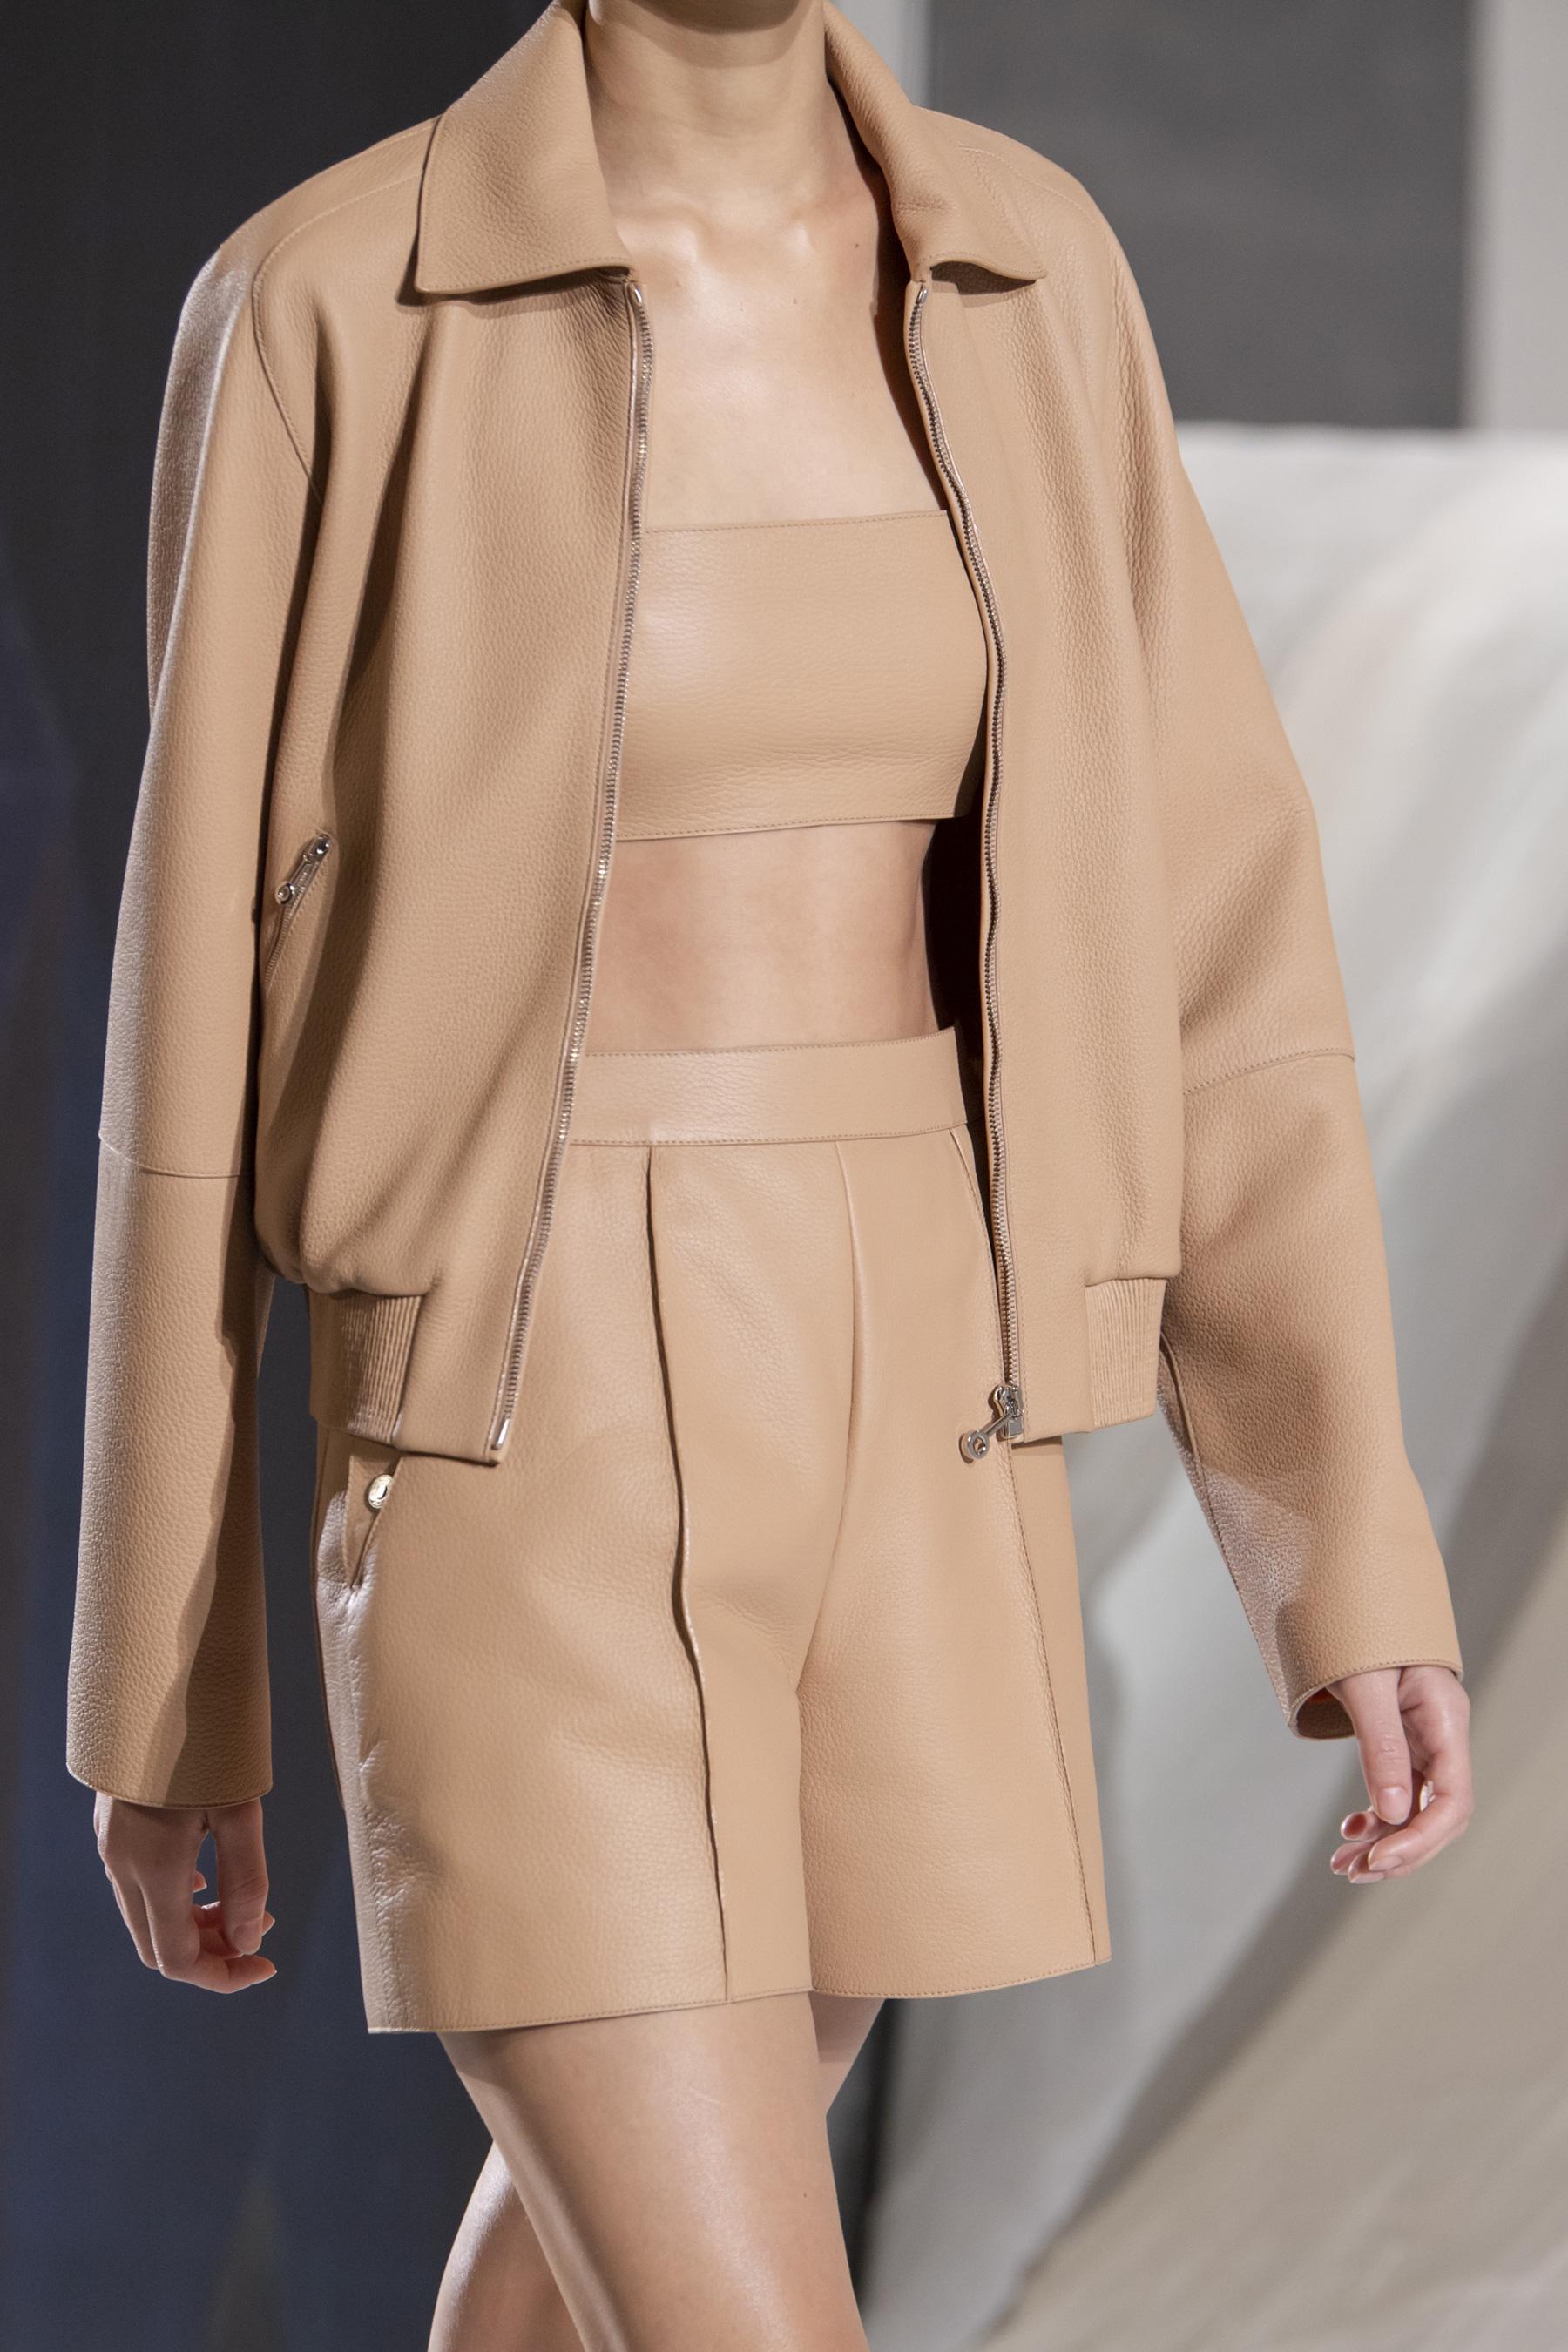 Hermes Spring 2021 Fashion Show Details